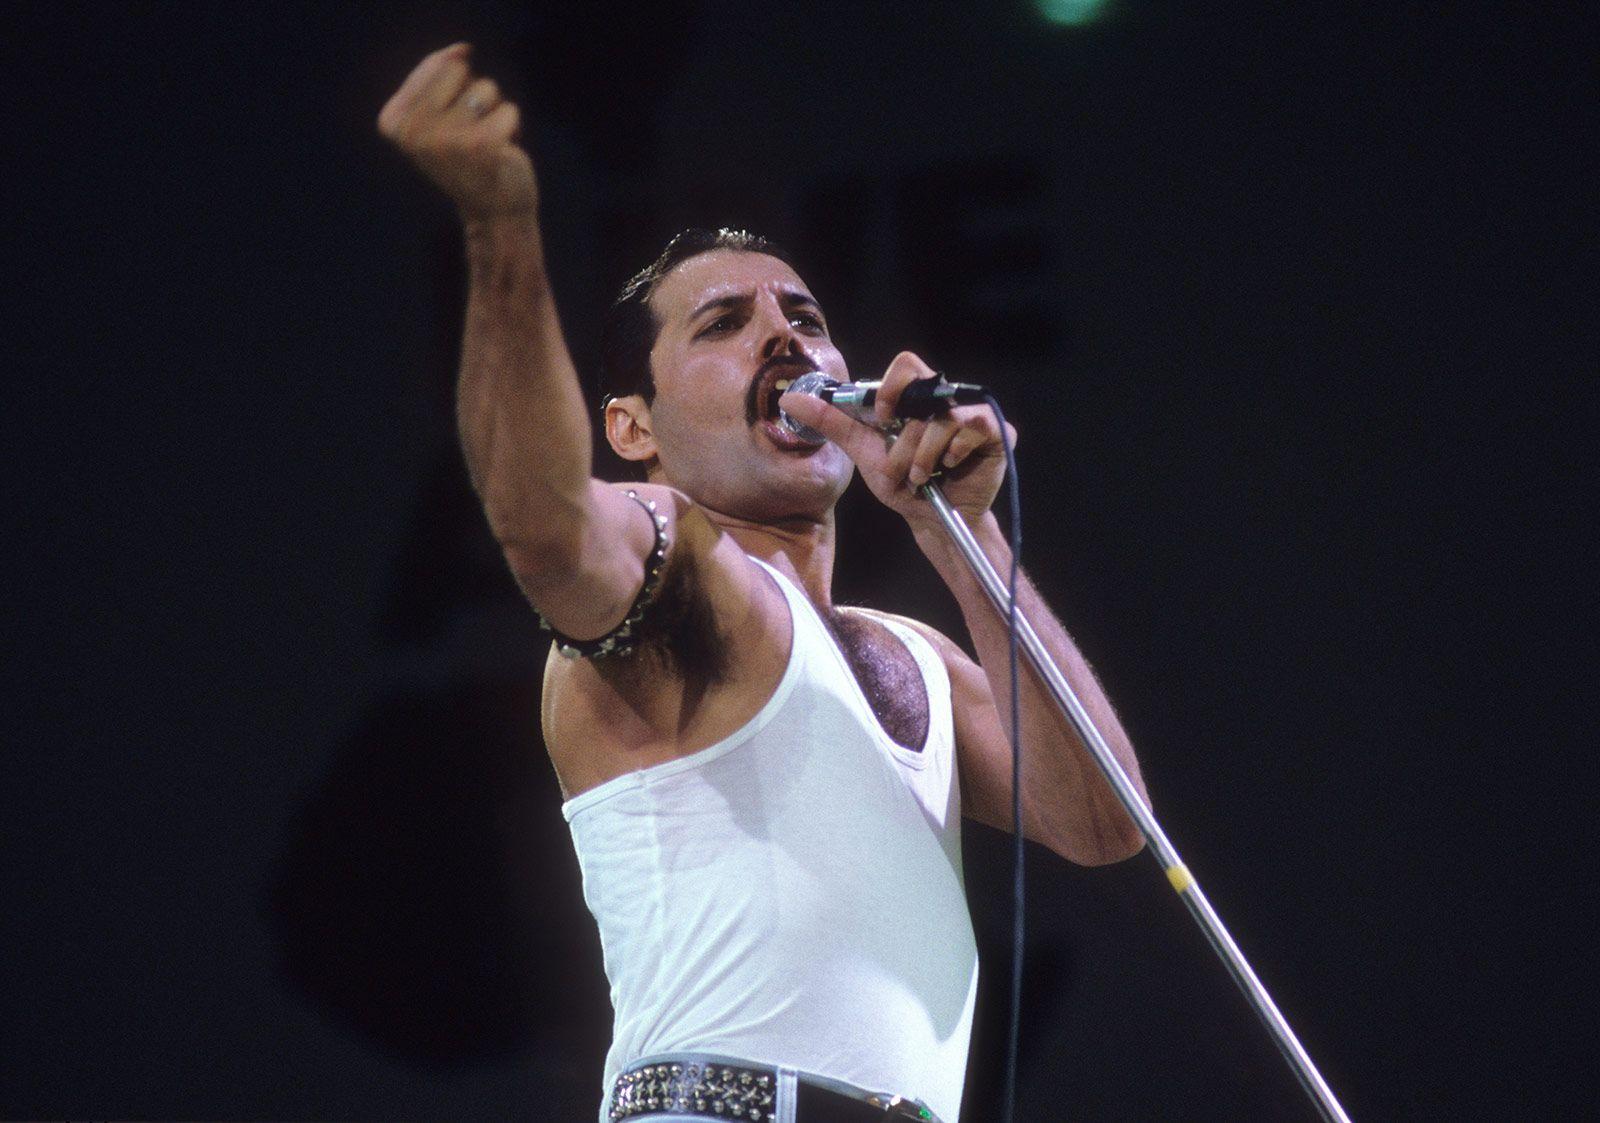 freddie mercury live aid queen 1985